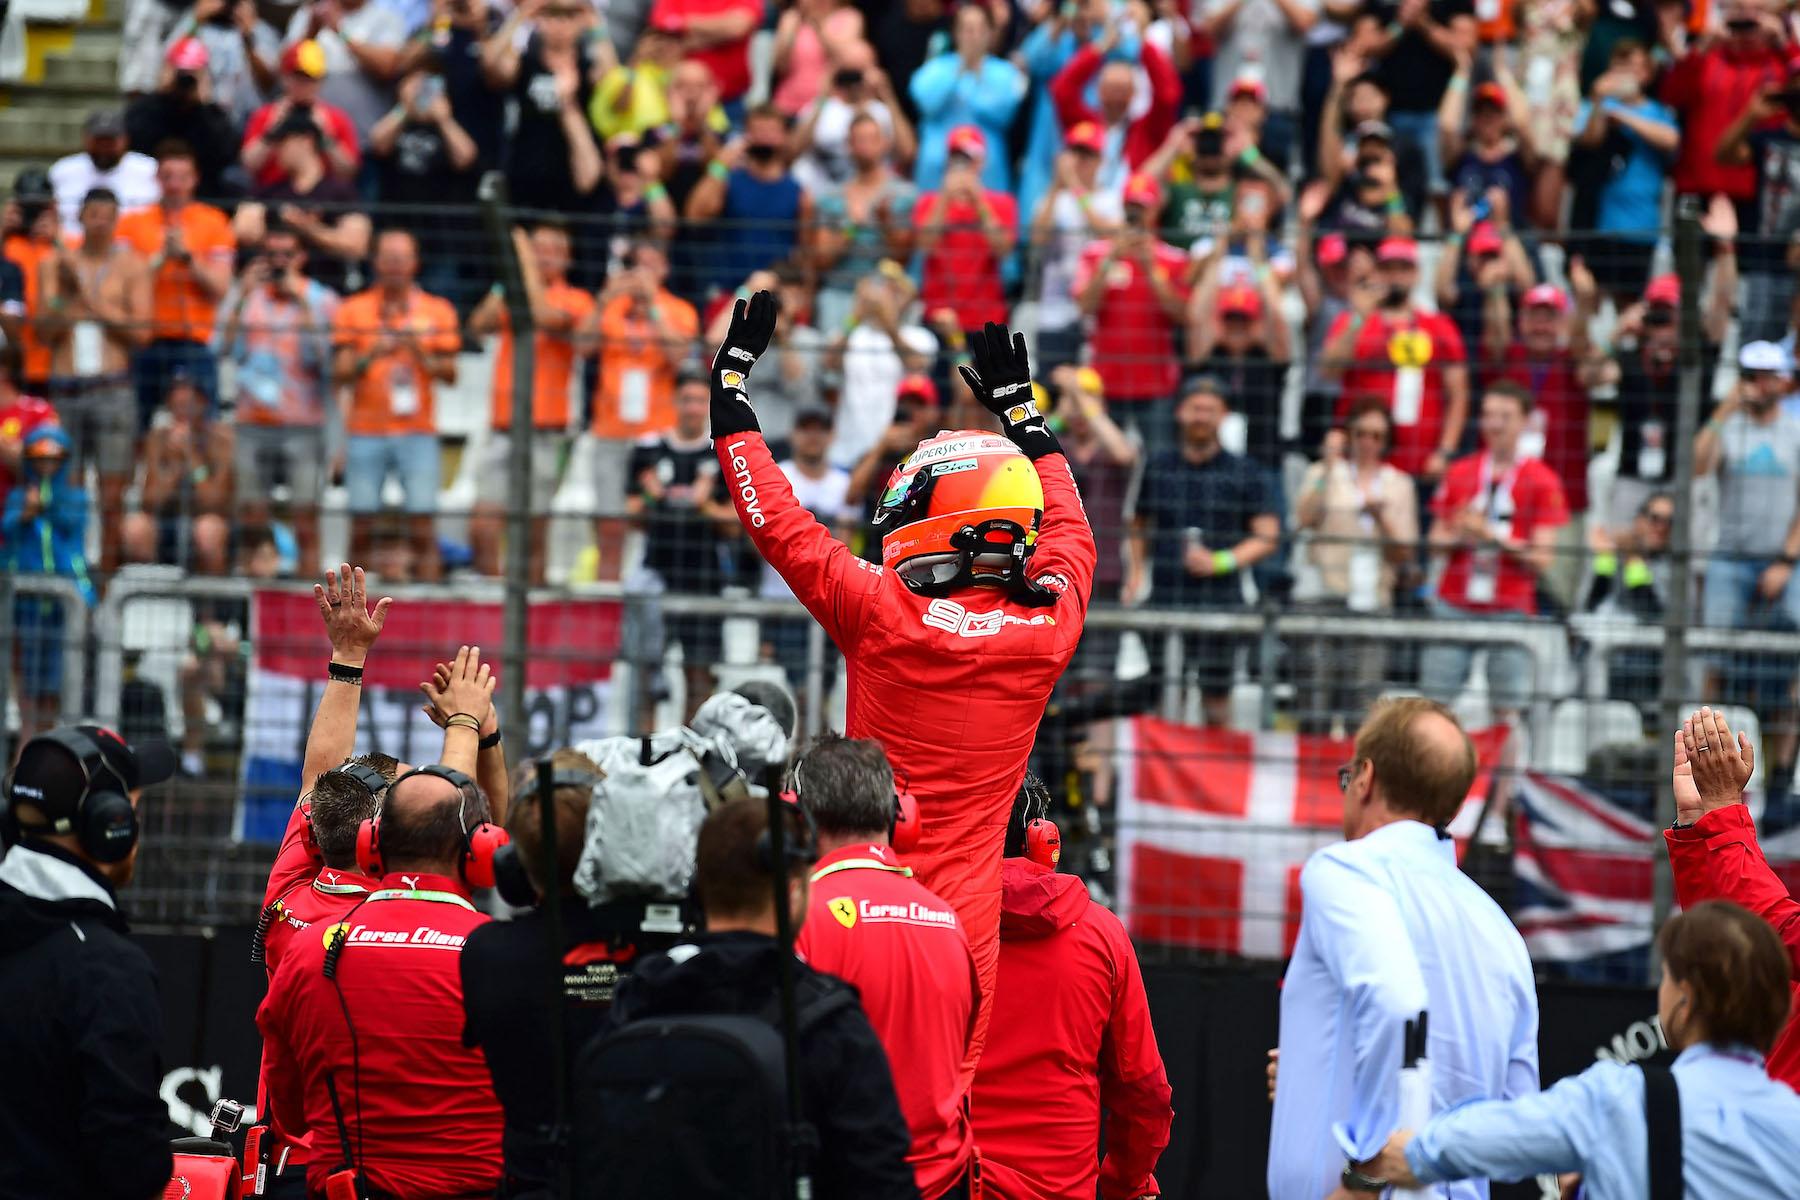 2019 Mick Schumacher | Ferrari F2004 | 2019 German GP 9 copy.jpg